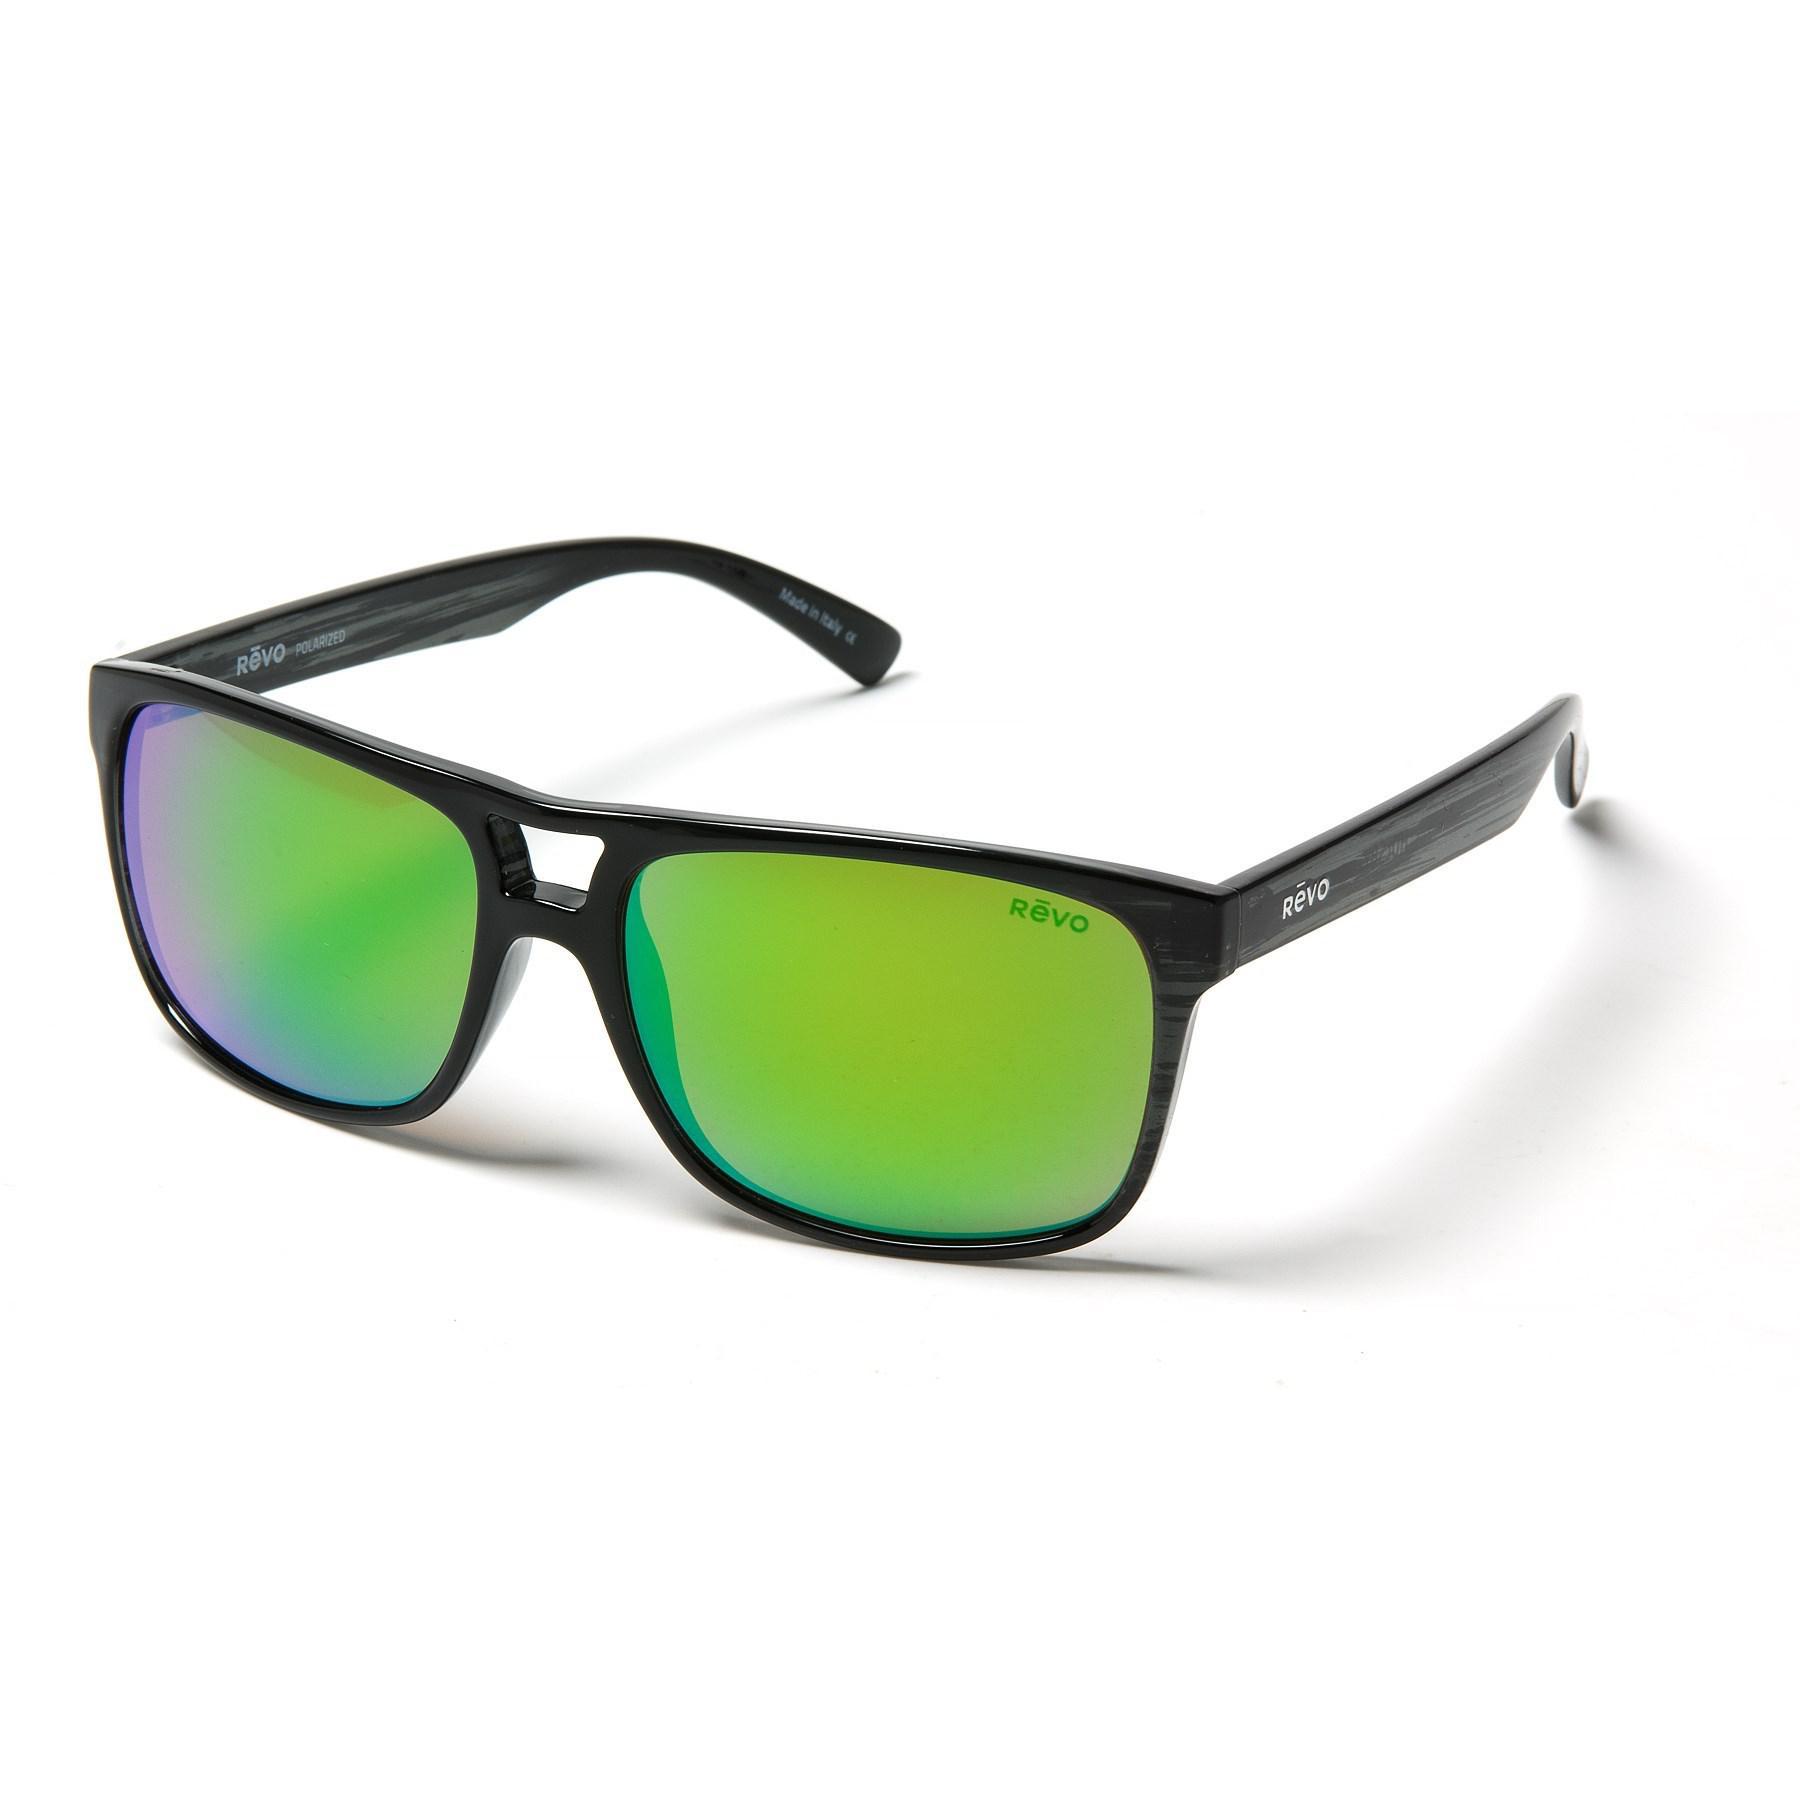 5b172b1ed3 Lyst - Revo Holsby Sunglasses in Green for Men